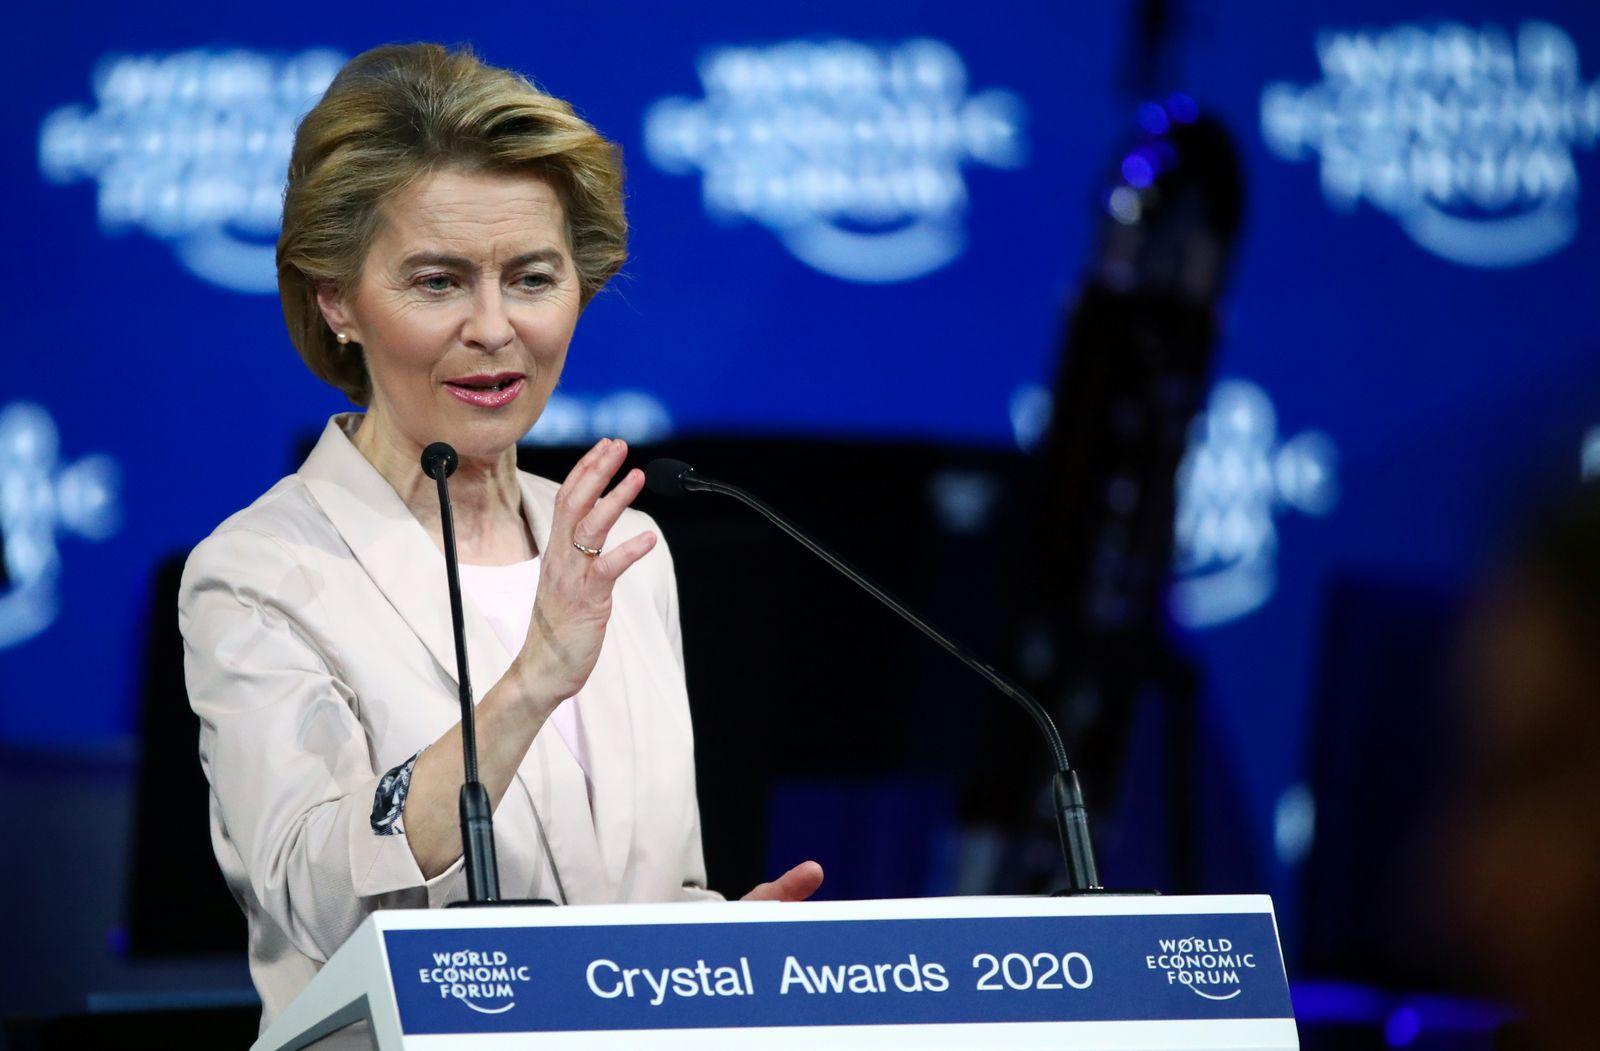 2020 World Economic Forum in Davos